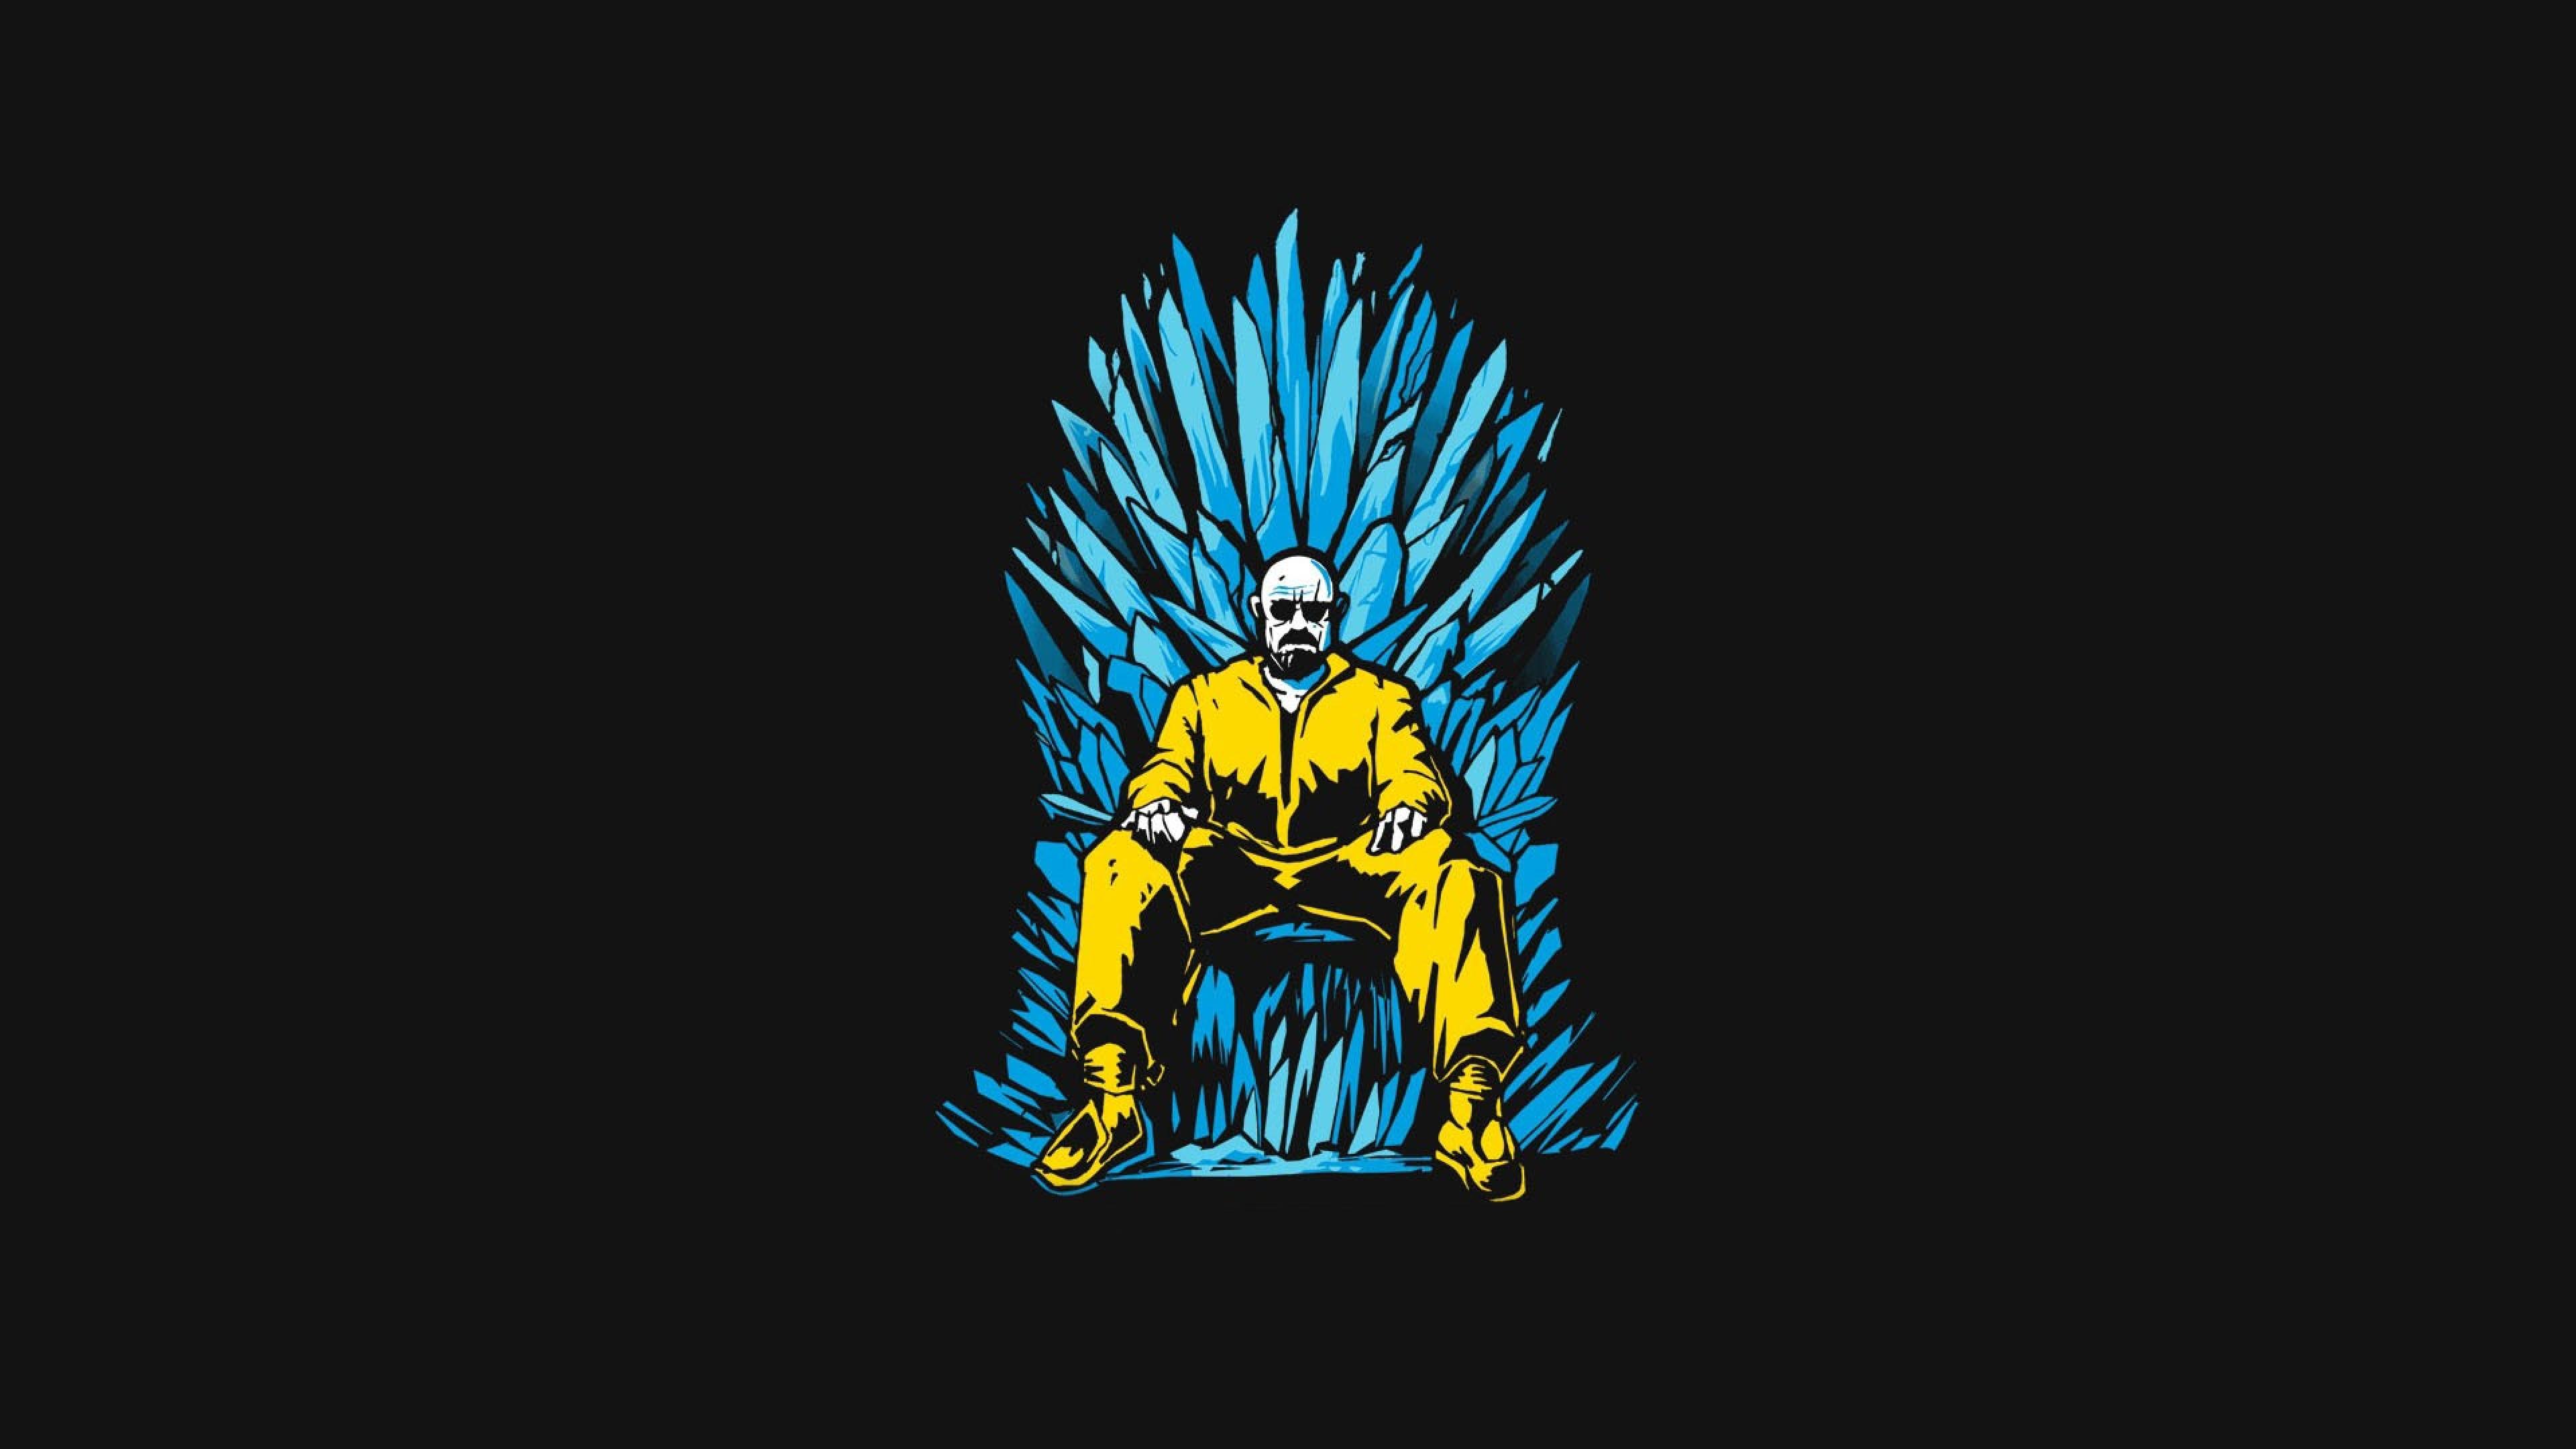 3840x2160 Walter White Game Of Thrones Minimalism 4k Wallpaper Hd